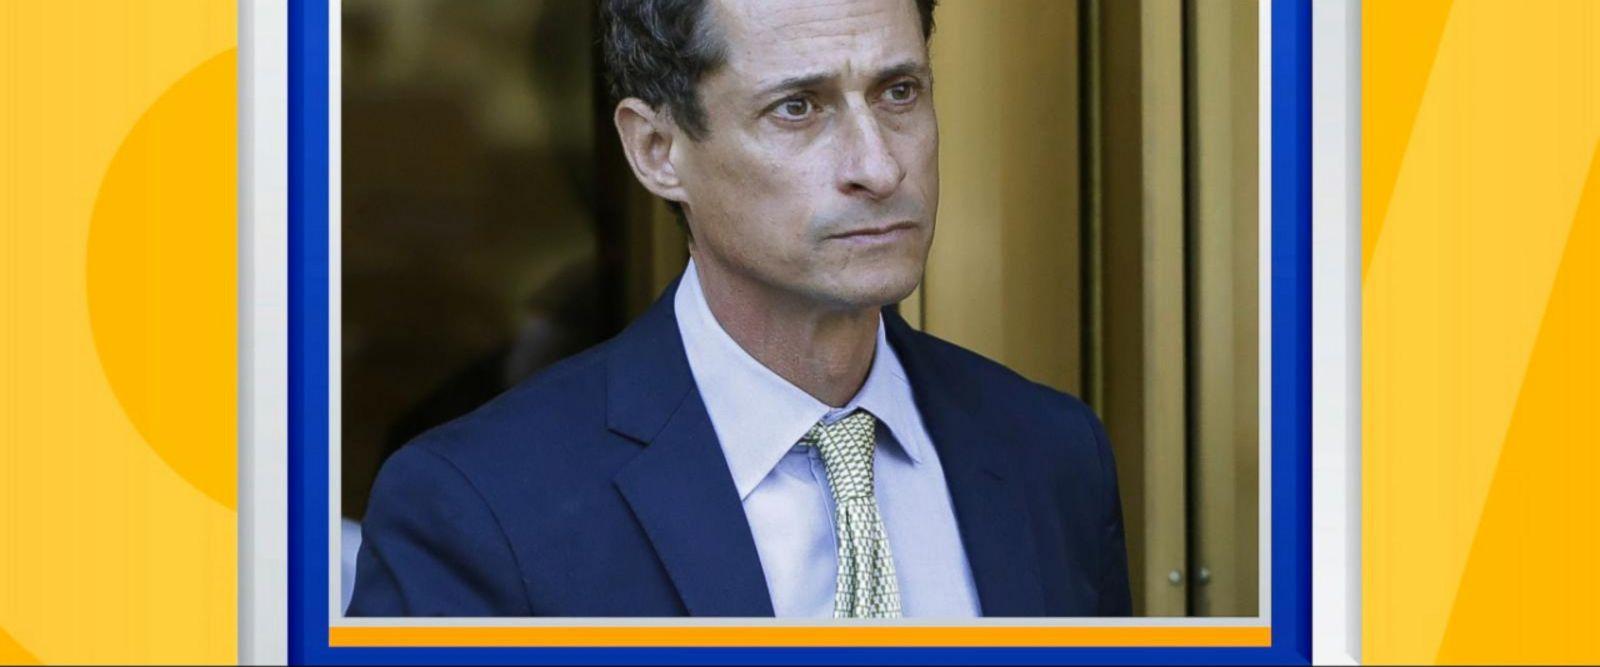 VIDEO: Anthony Weiner sentenced to prison